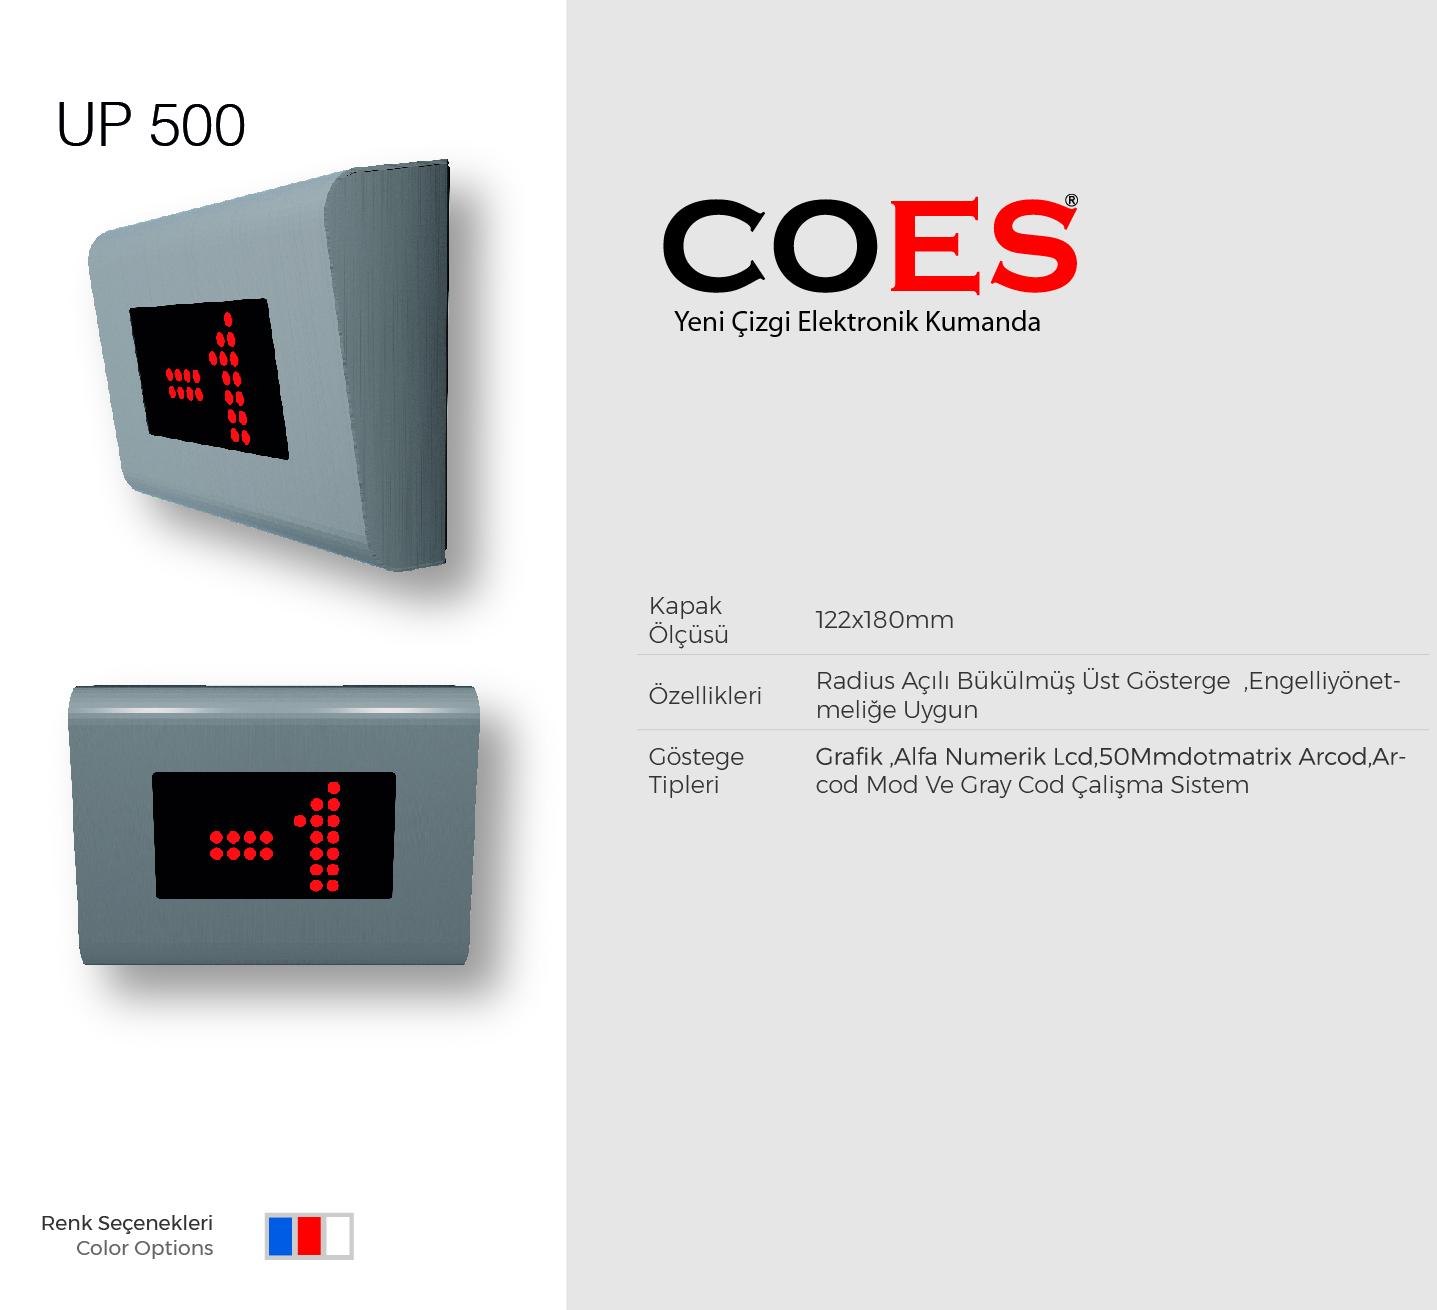 UP 500